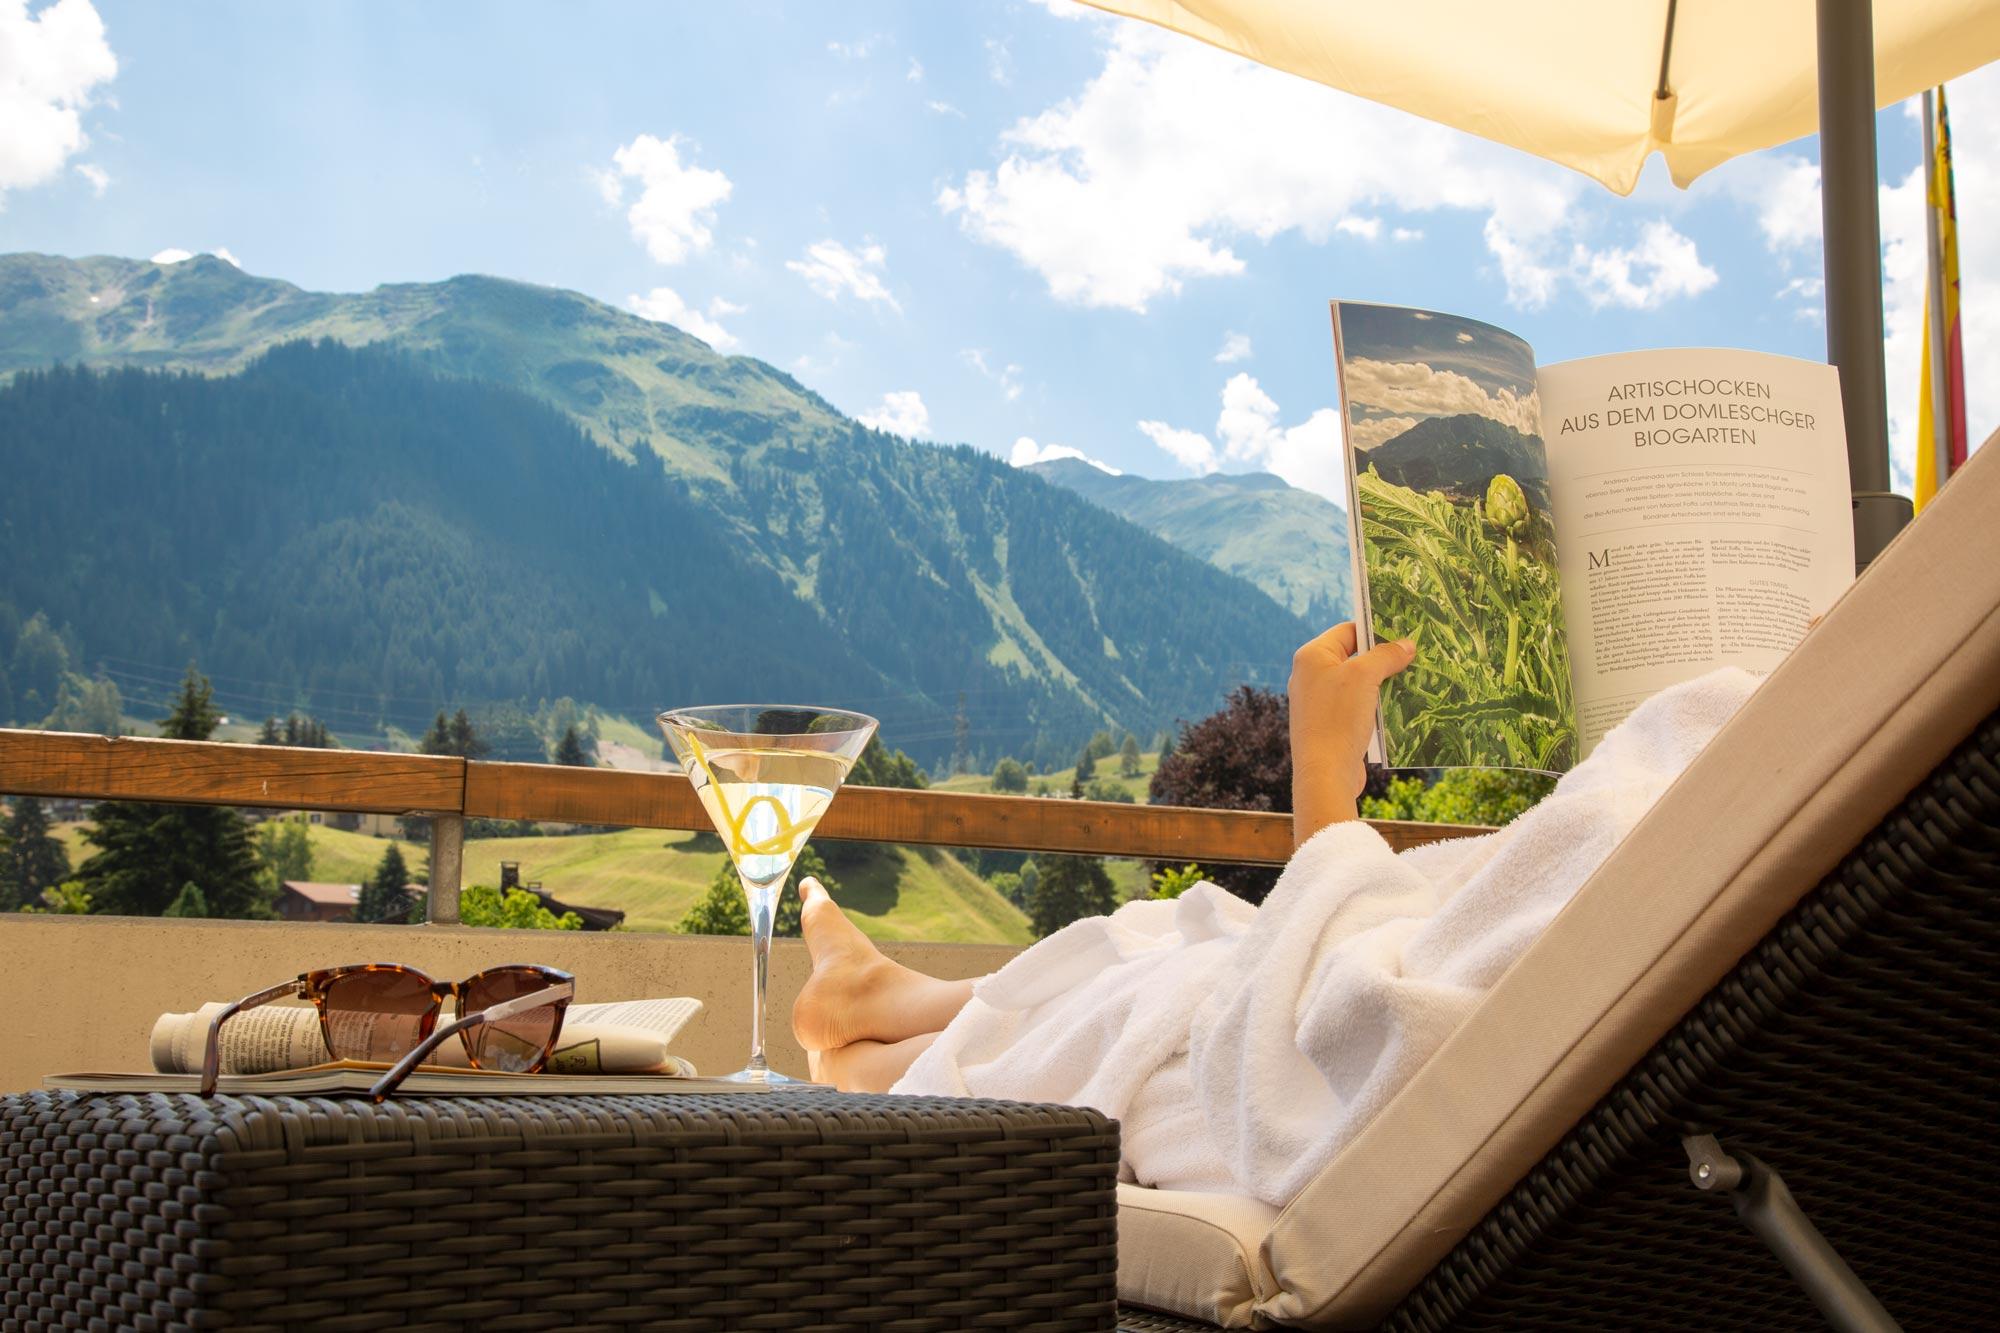 Relax Mountain Lifestyle Photography by Adrian Kilchherr, Hotel and Resort Photographer Switzerland Worldwide